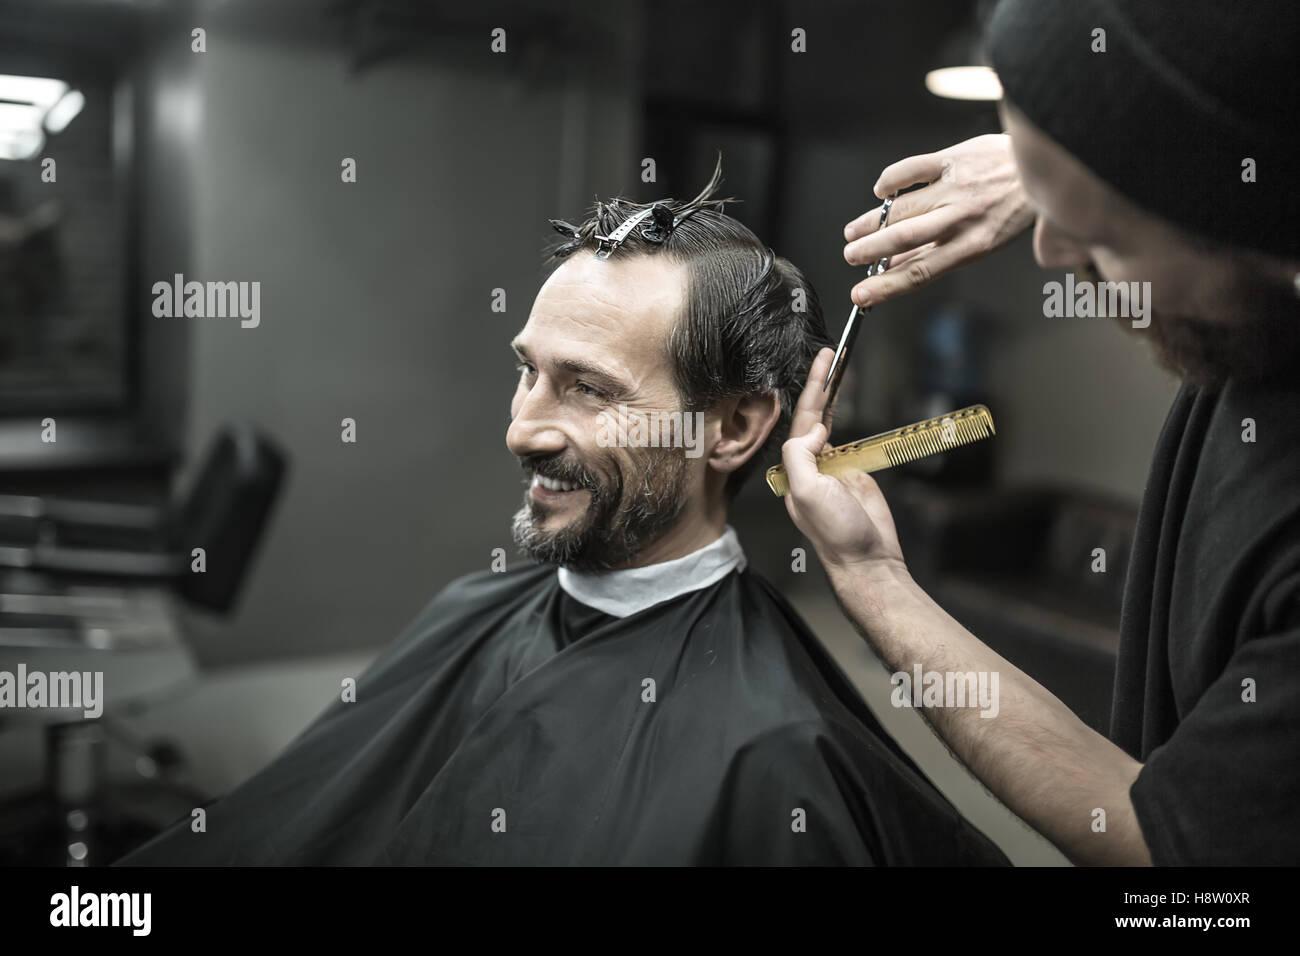 Cutting hair in barbershop - Stock Image